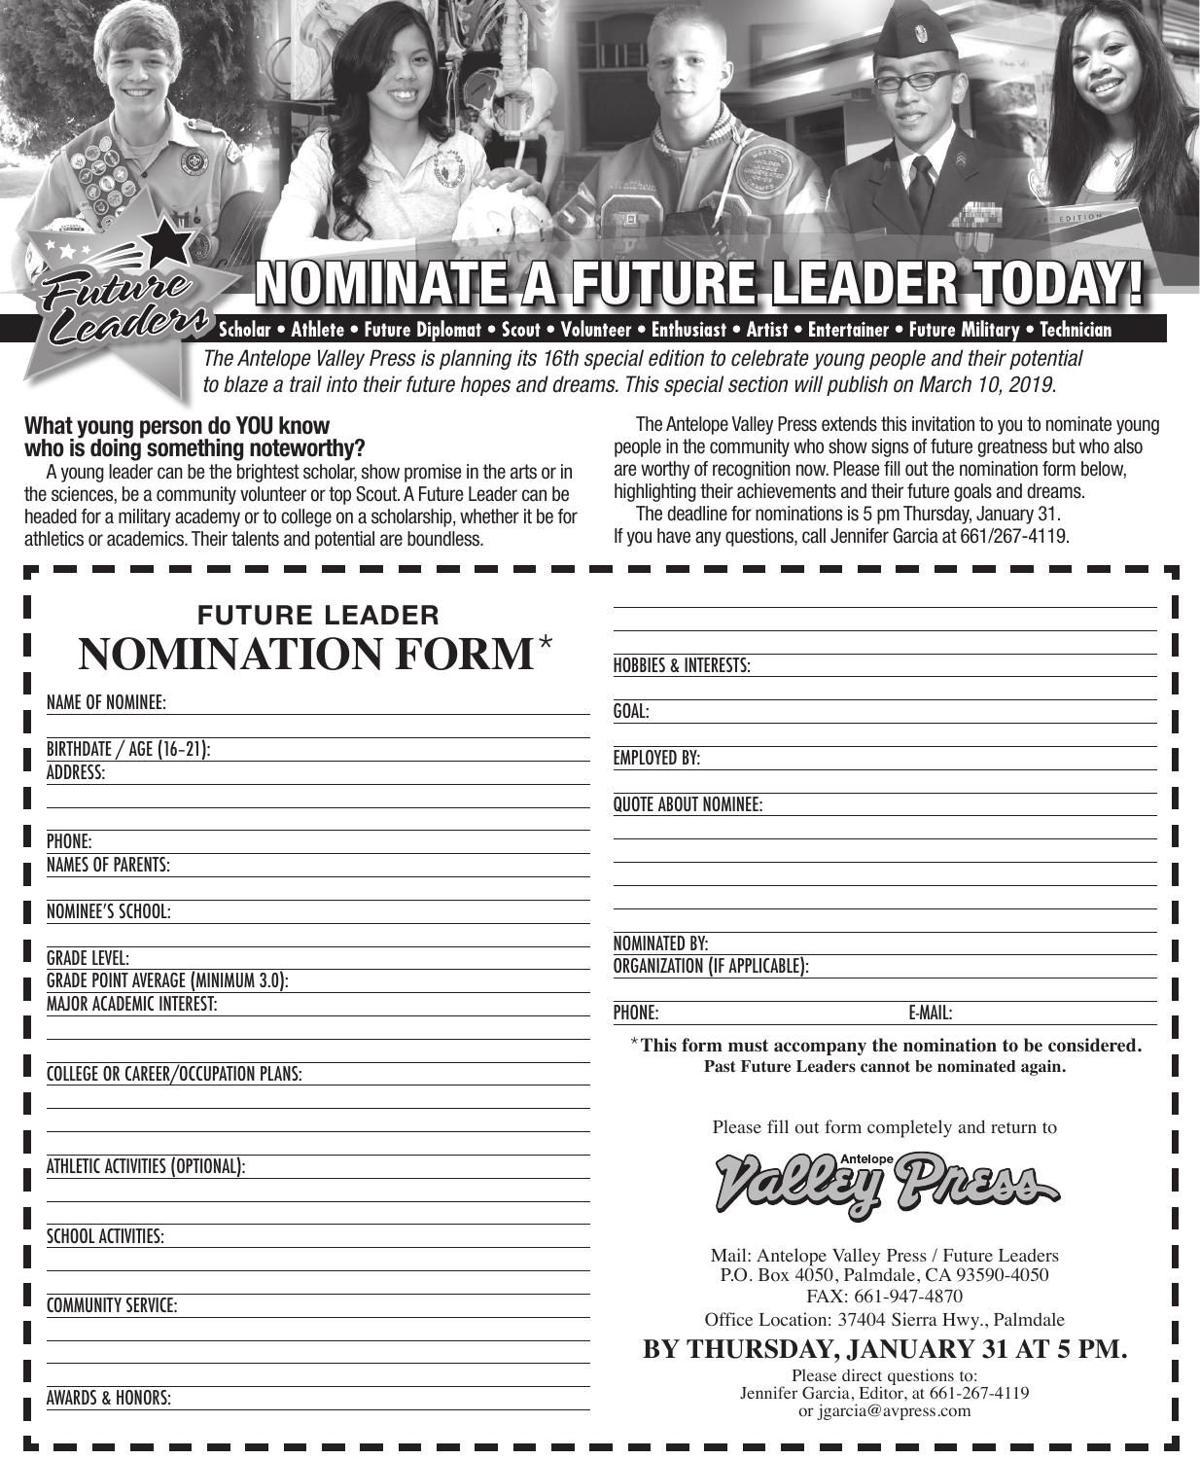 Future Leaders nomination form